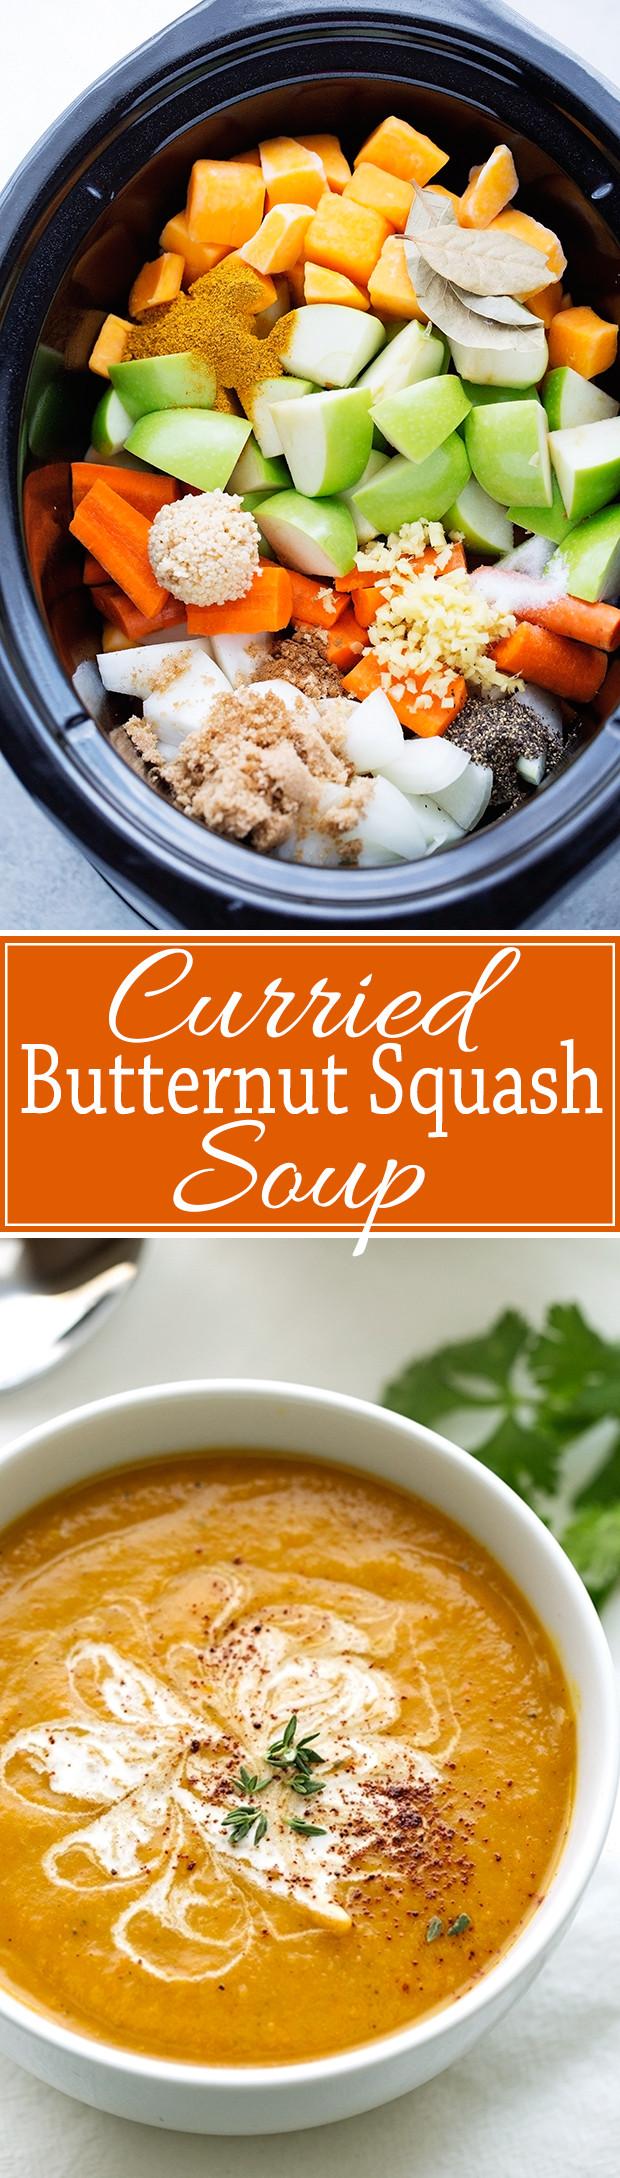 Slow Cooker Butternut Squash Soup  Slow Cooker Curried Butternut Squash Soup Recipe